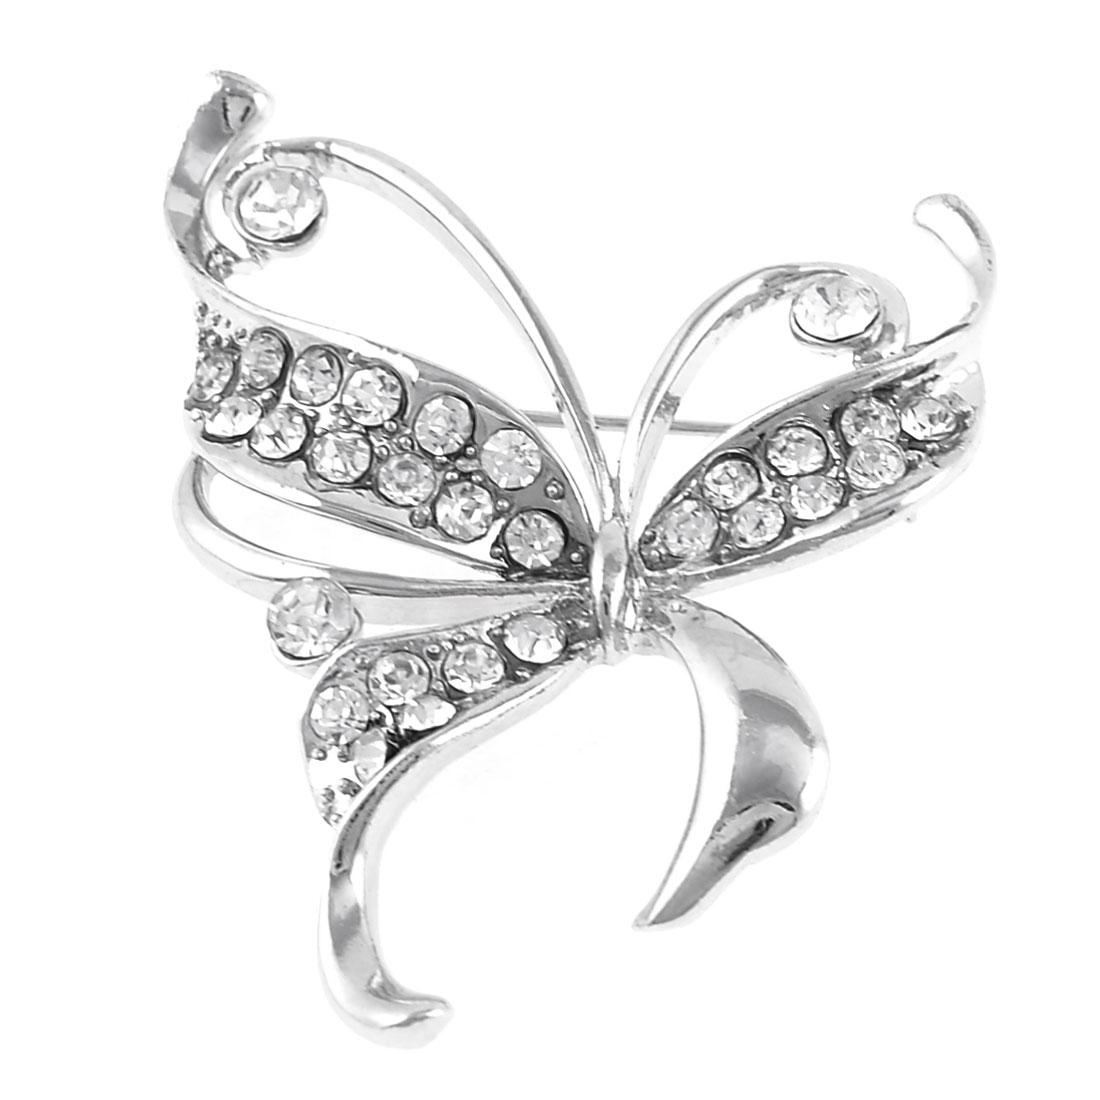 Glittery Rhinestone Inlaid Bowknot Detail Brooch Breastpin Silver Tone